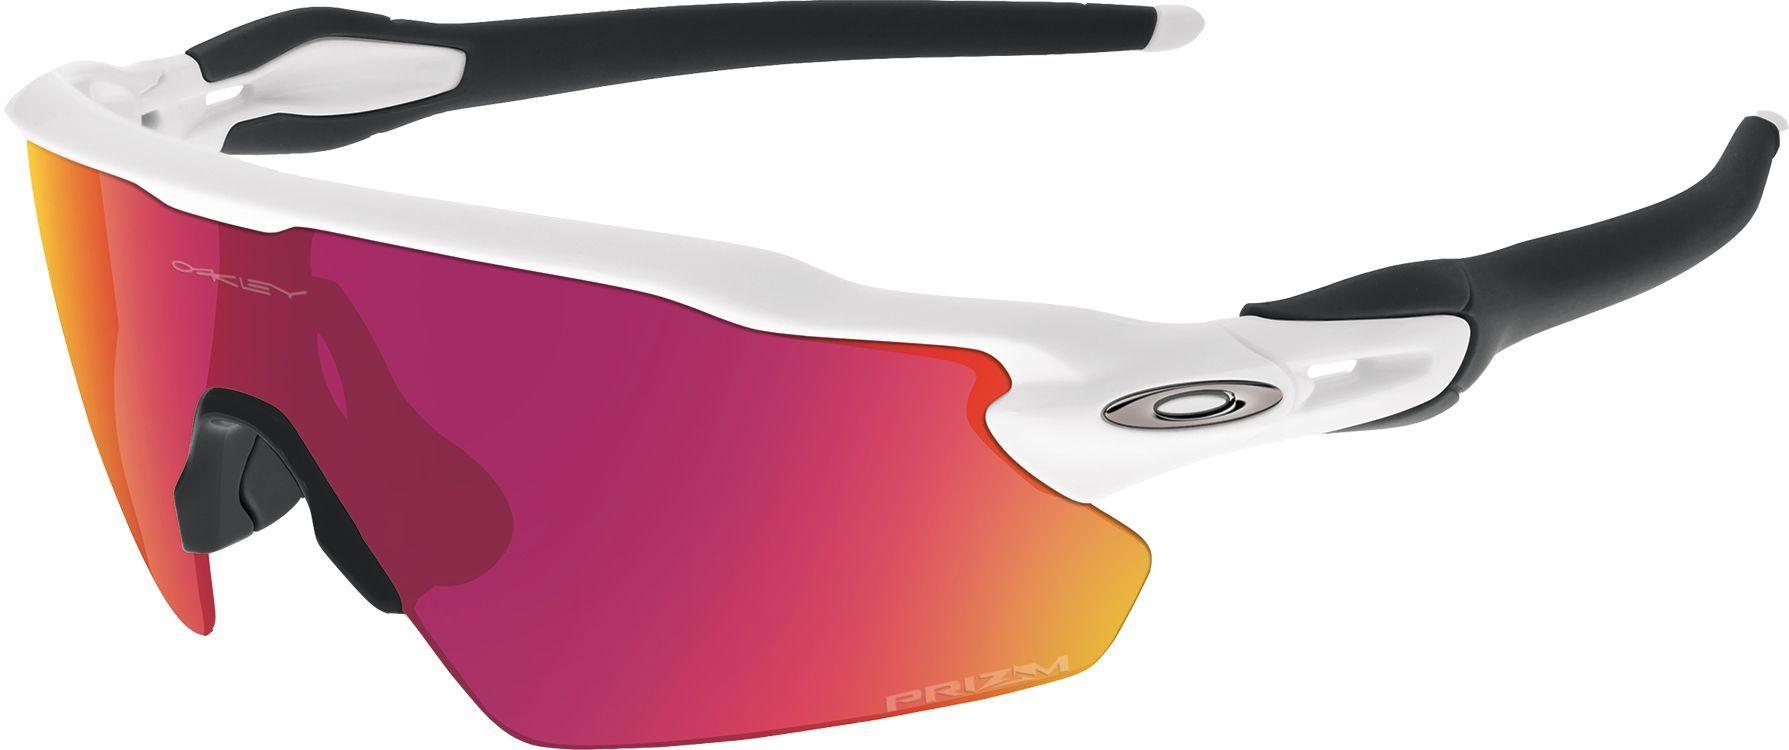 Oakley Radar EV Pitch Baseball Sunglasses, Polished White